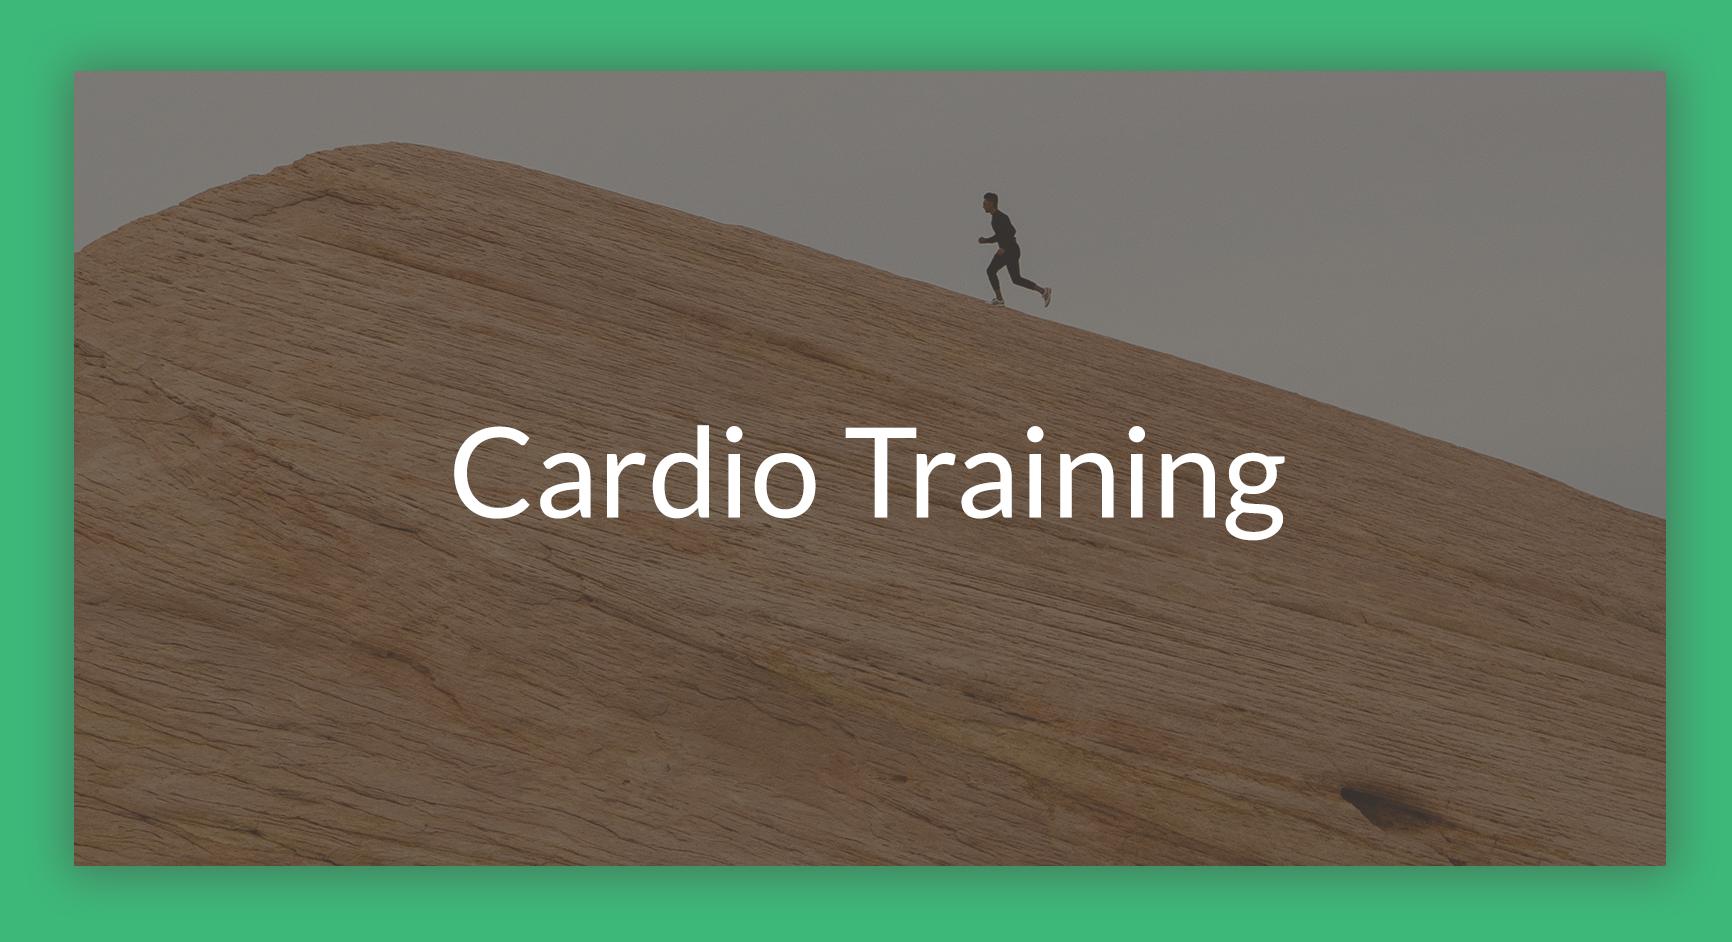 cardio-training_green.png